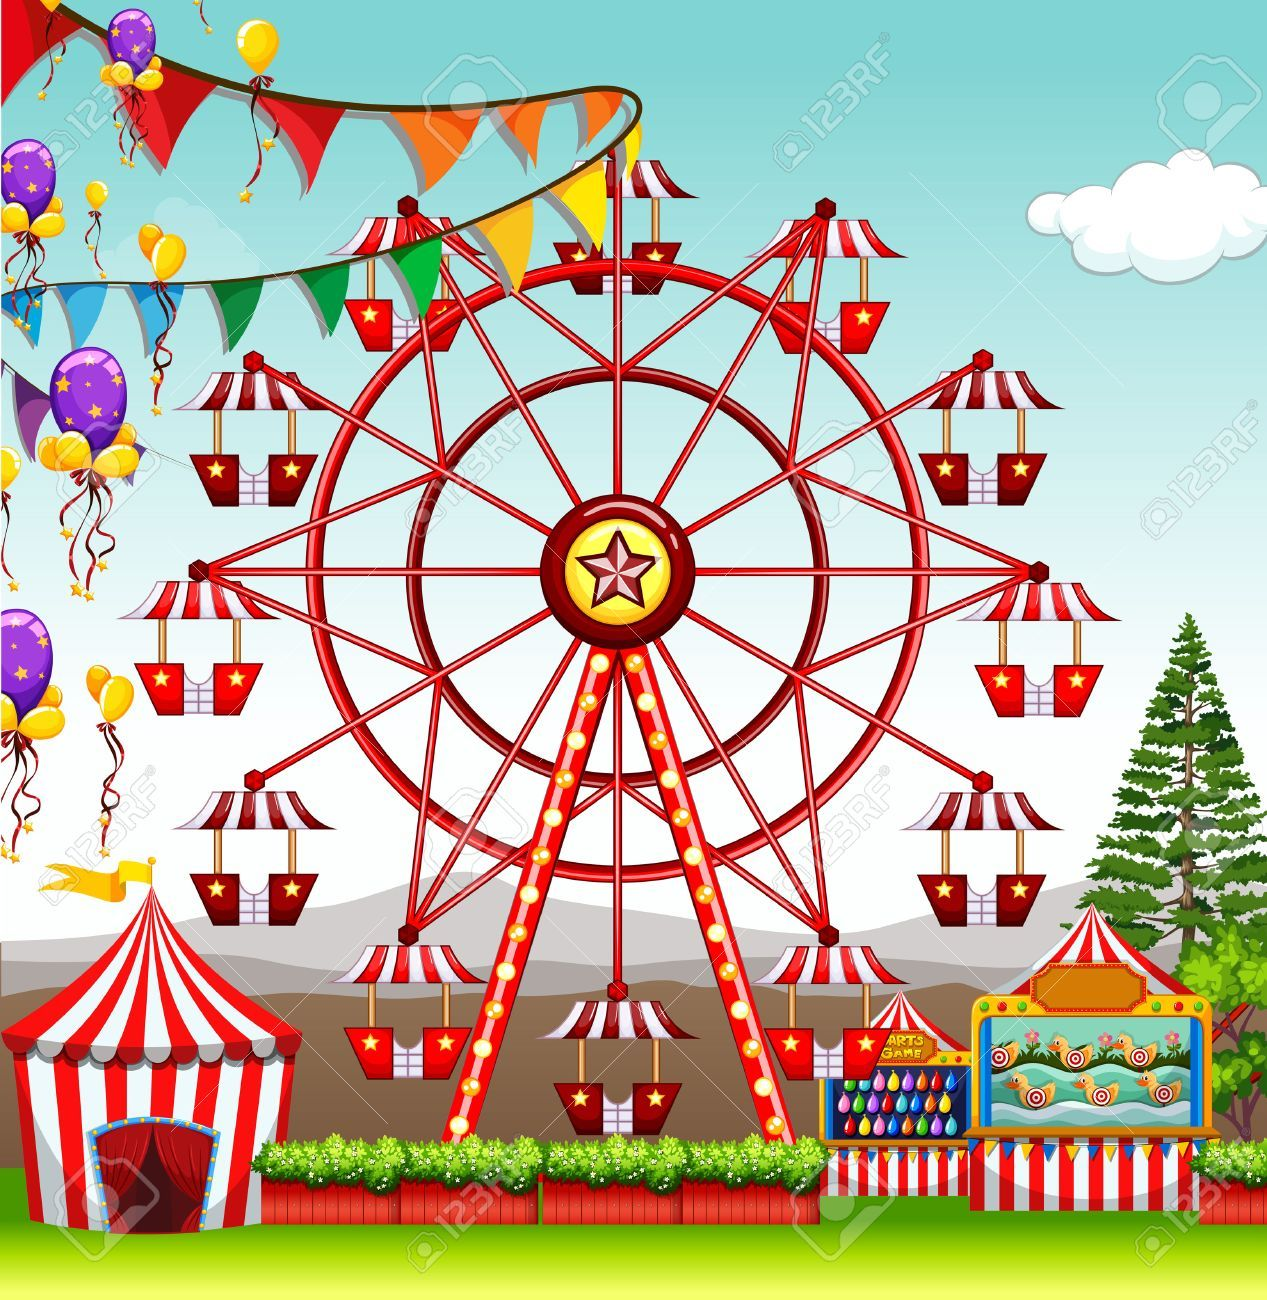 Carnival ferris wheel clipart 4 » Clipart Portal.